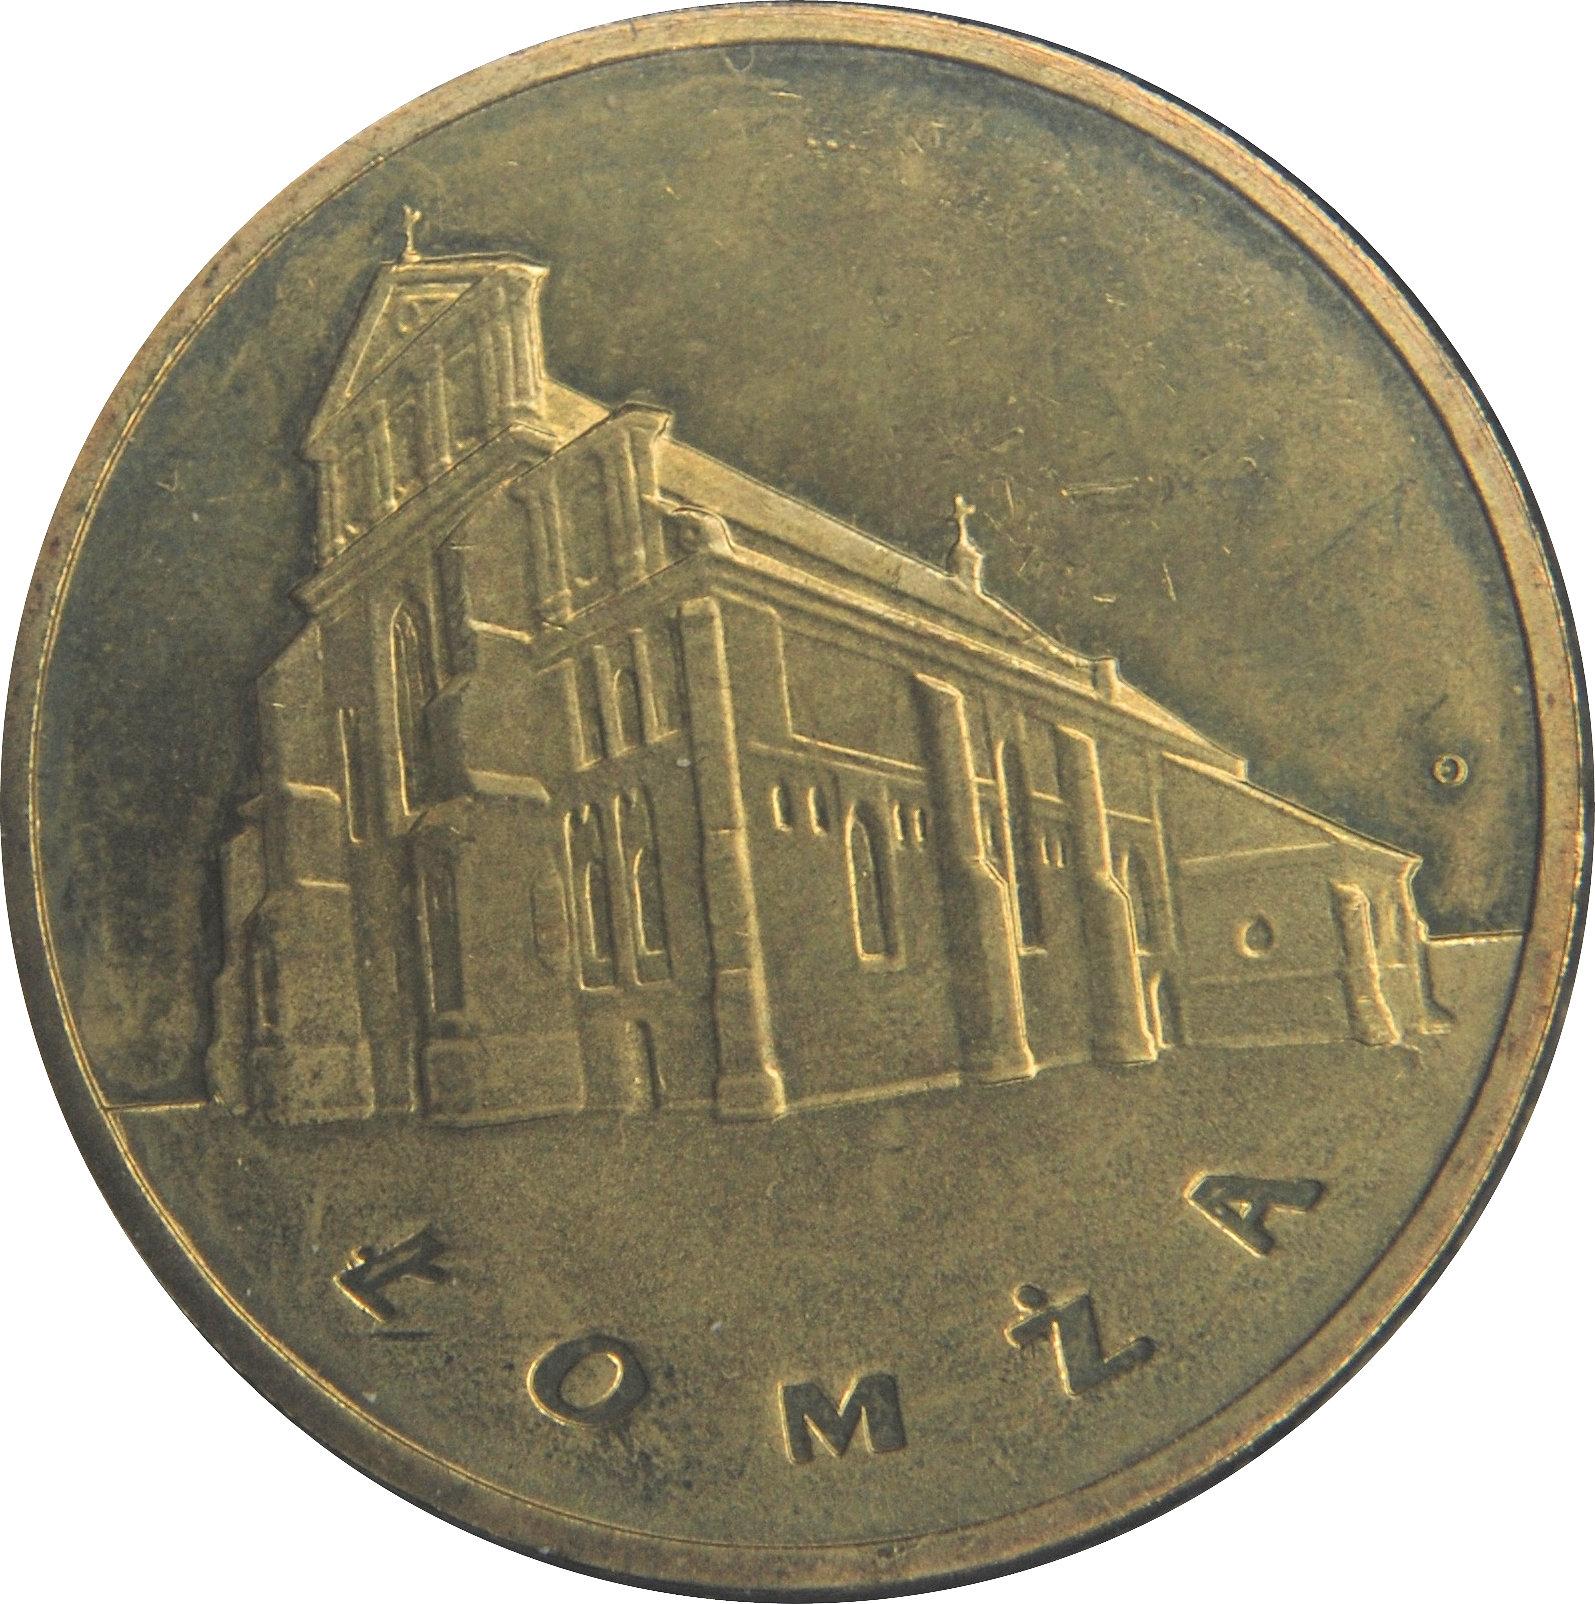 2 злотых ломжа набор юбилейных монет цена